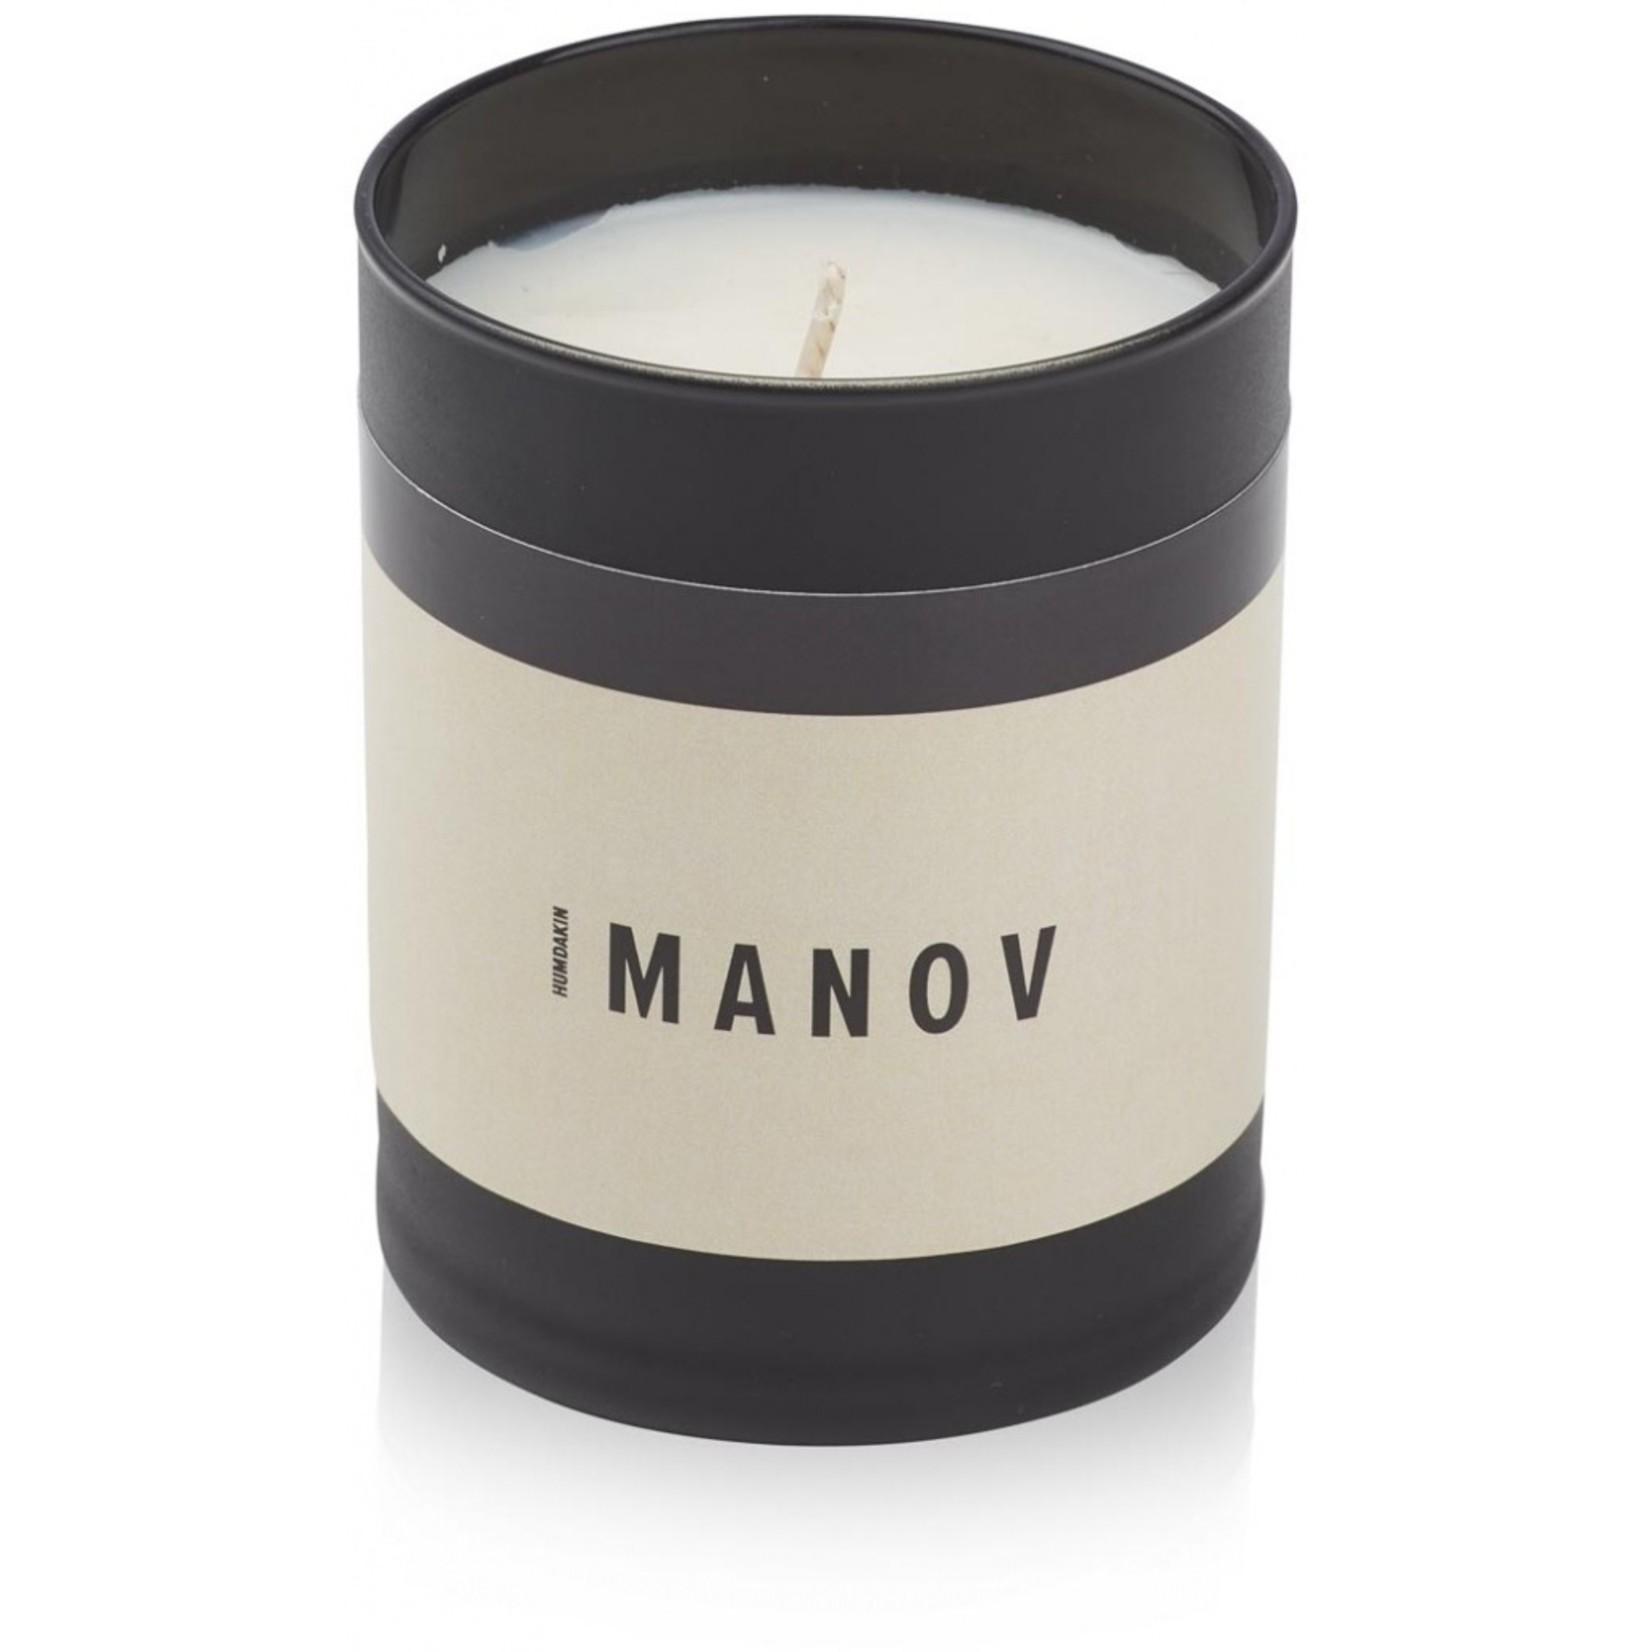 humdakin humdakin scented candle - manov